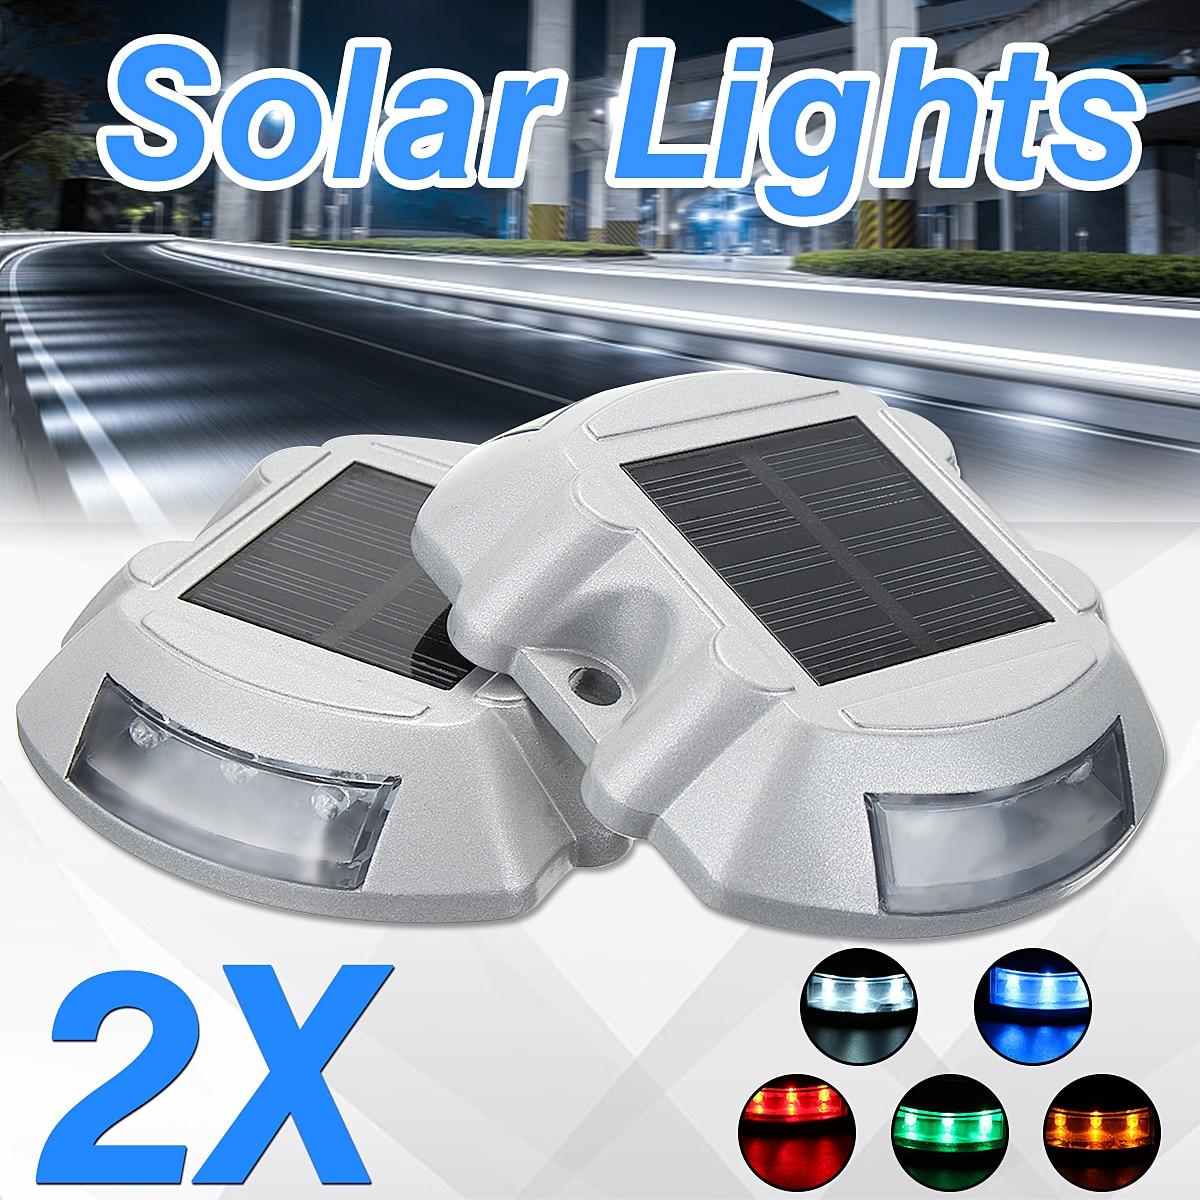 2PCS Solar LED Waterproof Pathway Driveway Light Lamp Dock Path Step Road Yard 5 Color Outdoor Path Lamp